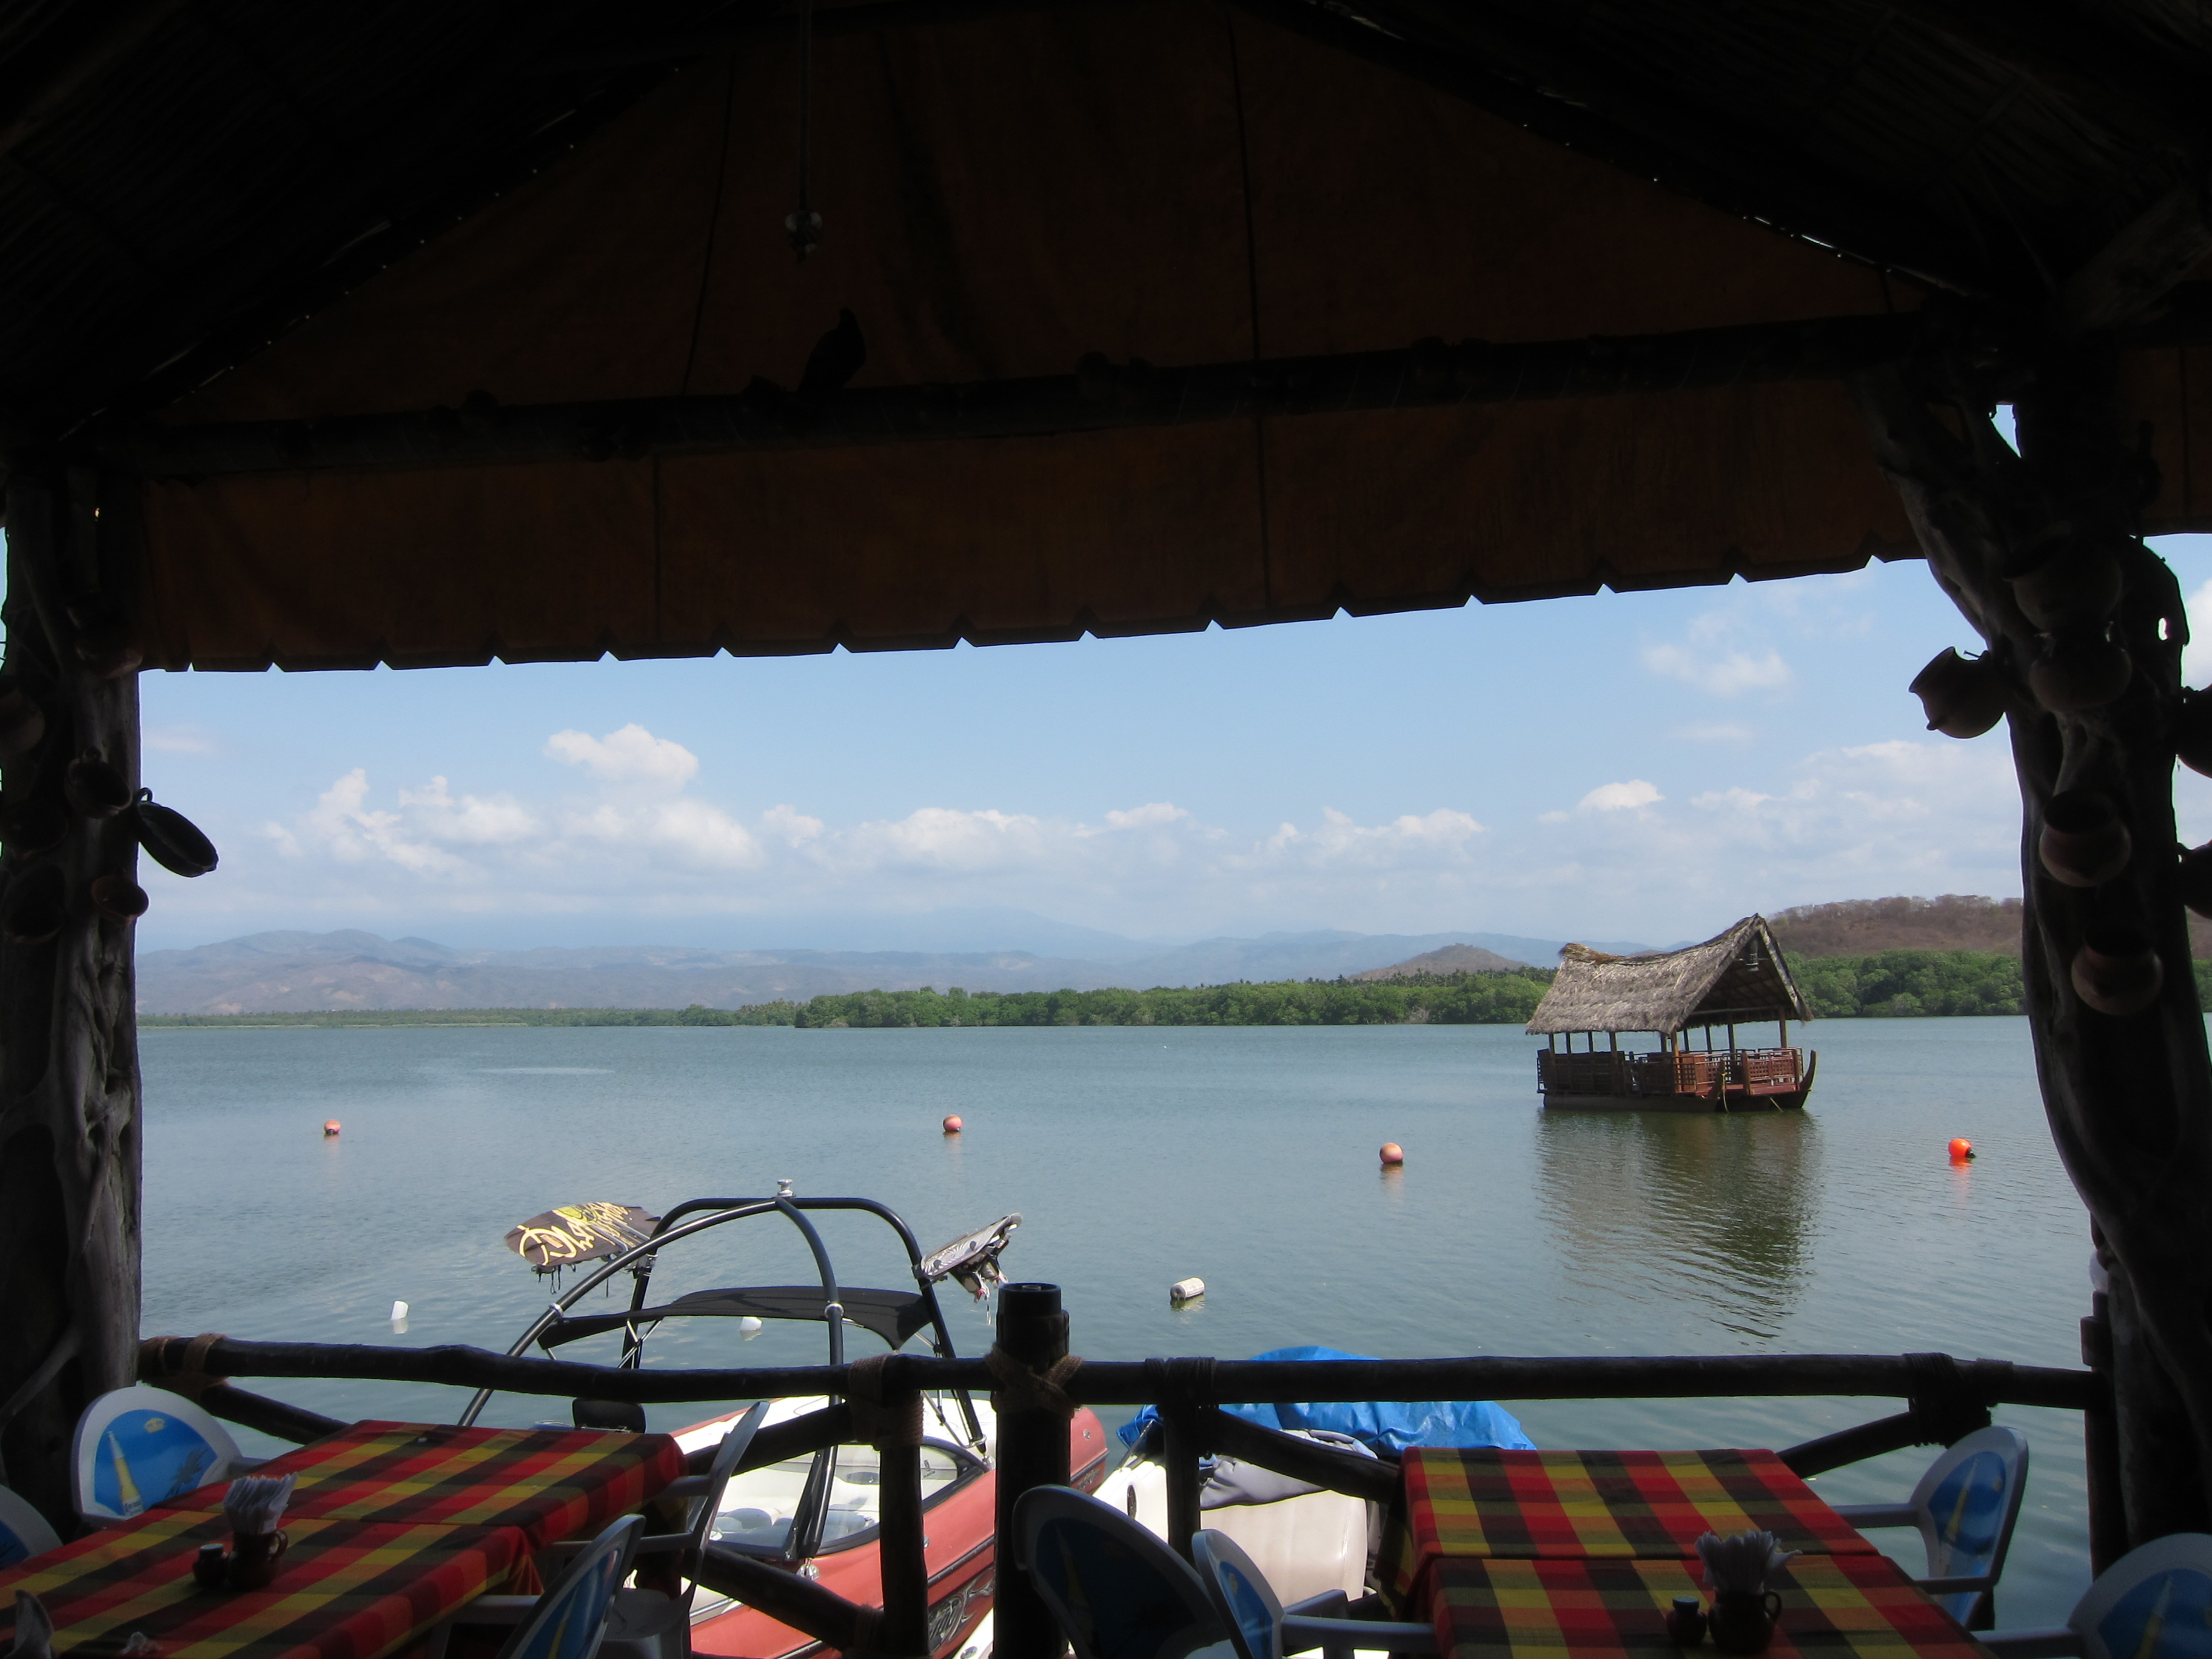 Blick auf die Lagune